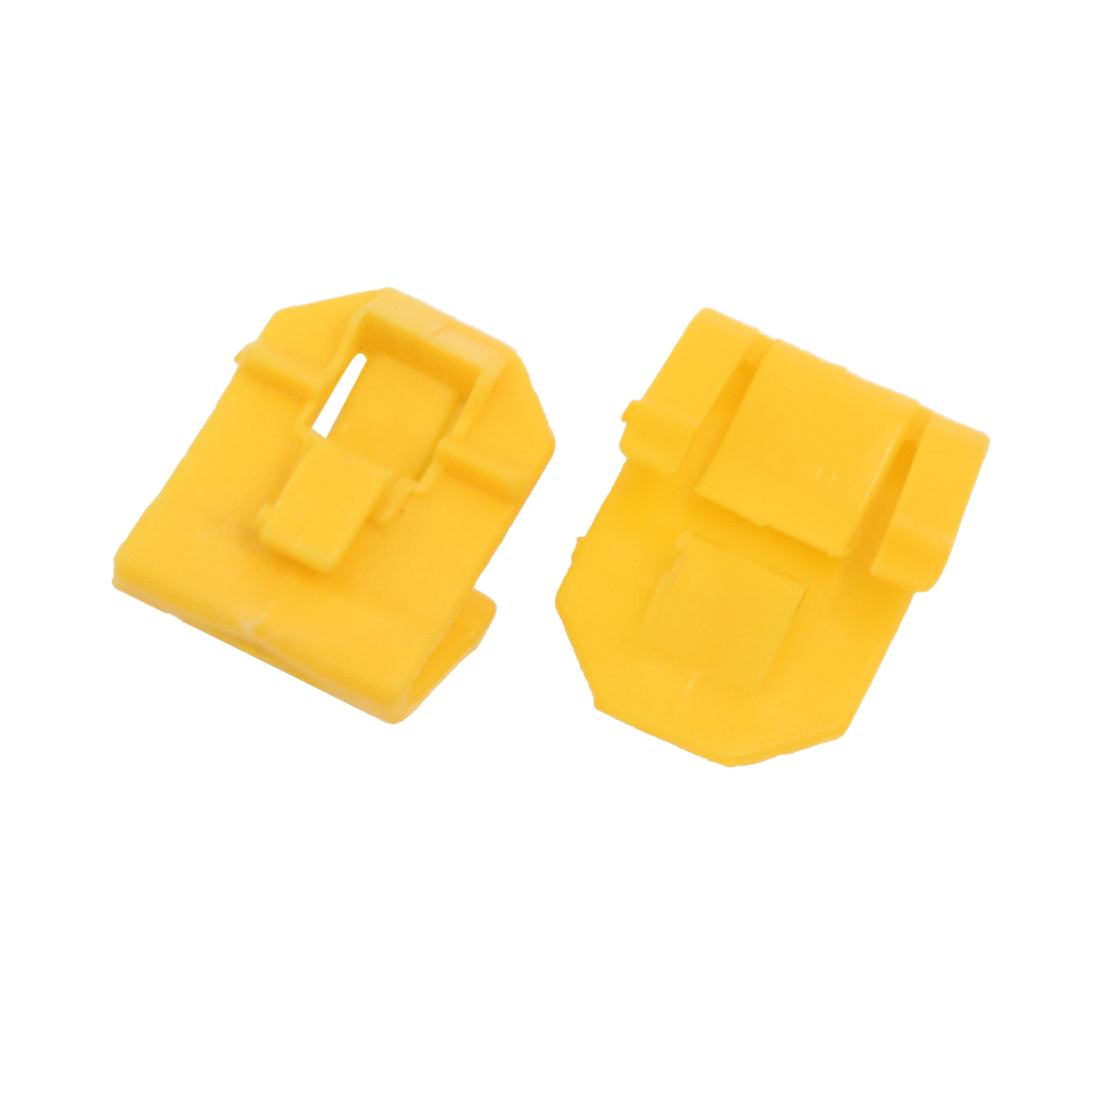 50PCS Yellow Auto Car Plastic Fastener Rivets Trim Instrument Panel Dashboard